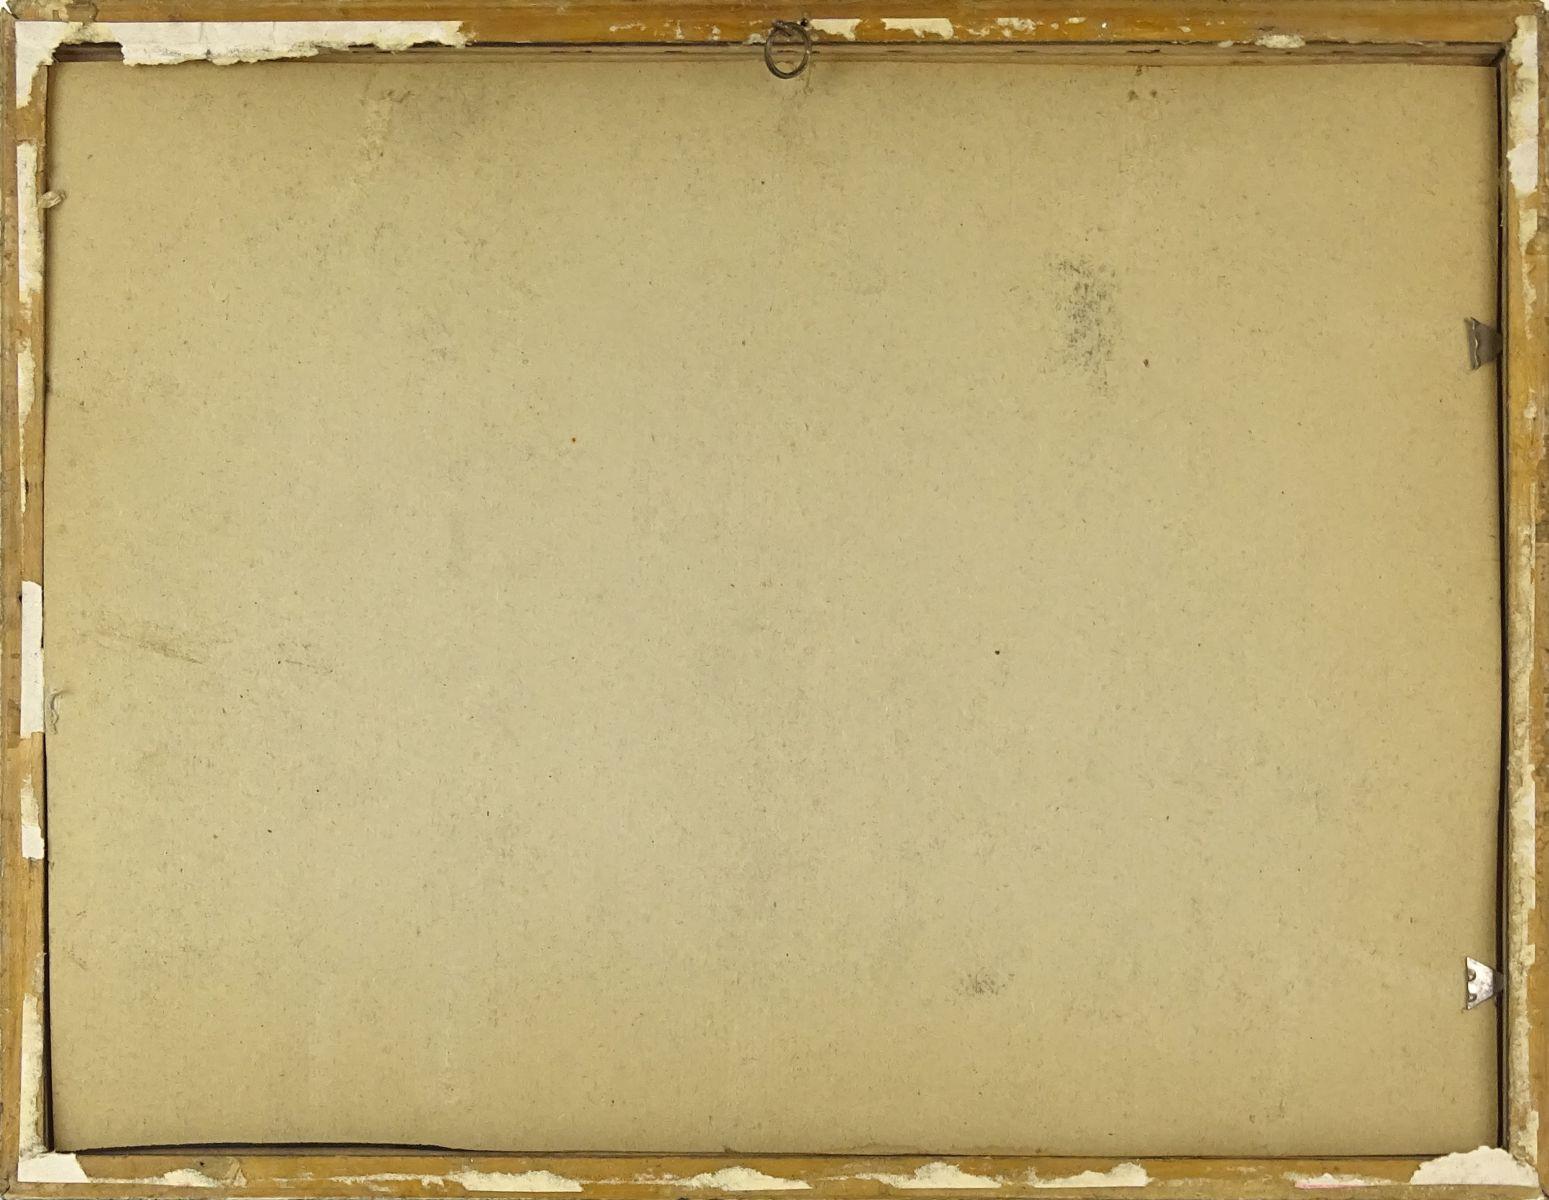 DSC01760.JPG (1549×1200)